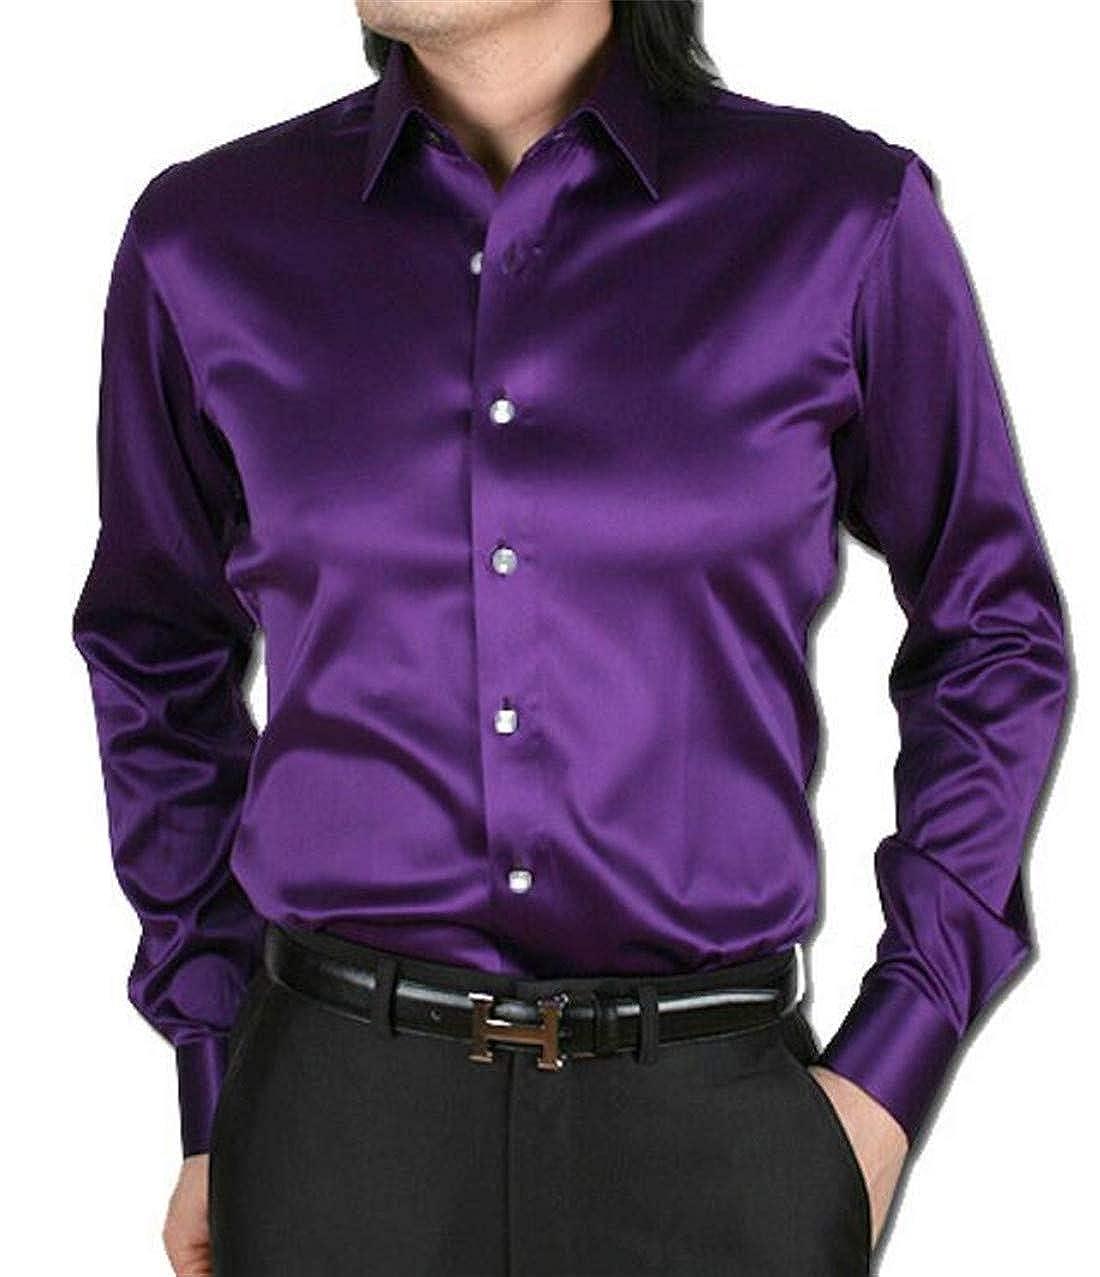 KLJR Men Slim Fit Shiny Satin Silk Like Long Sleeve Dress Shirts